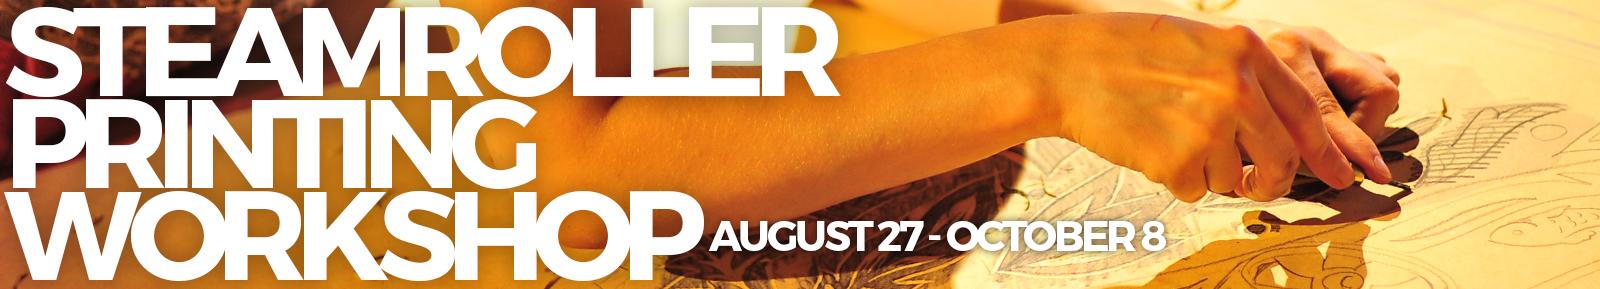 steamroller print banner 2017